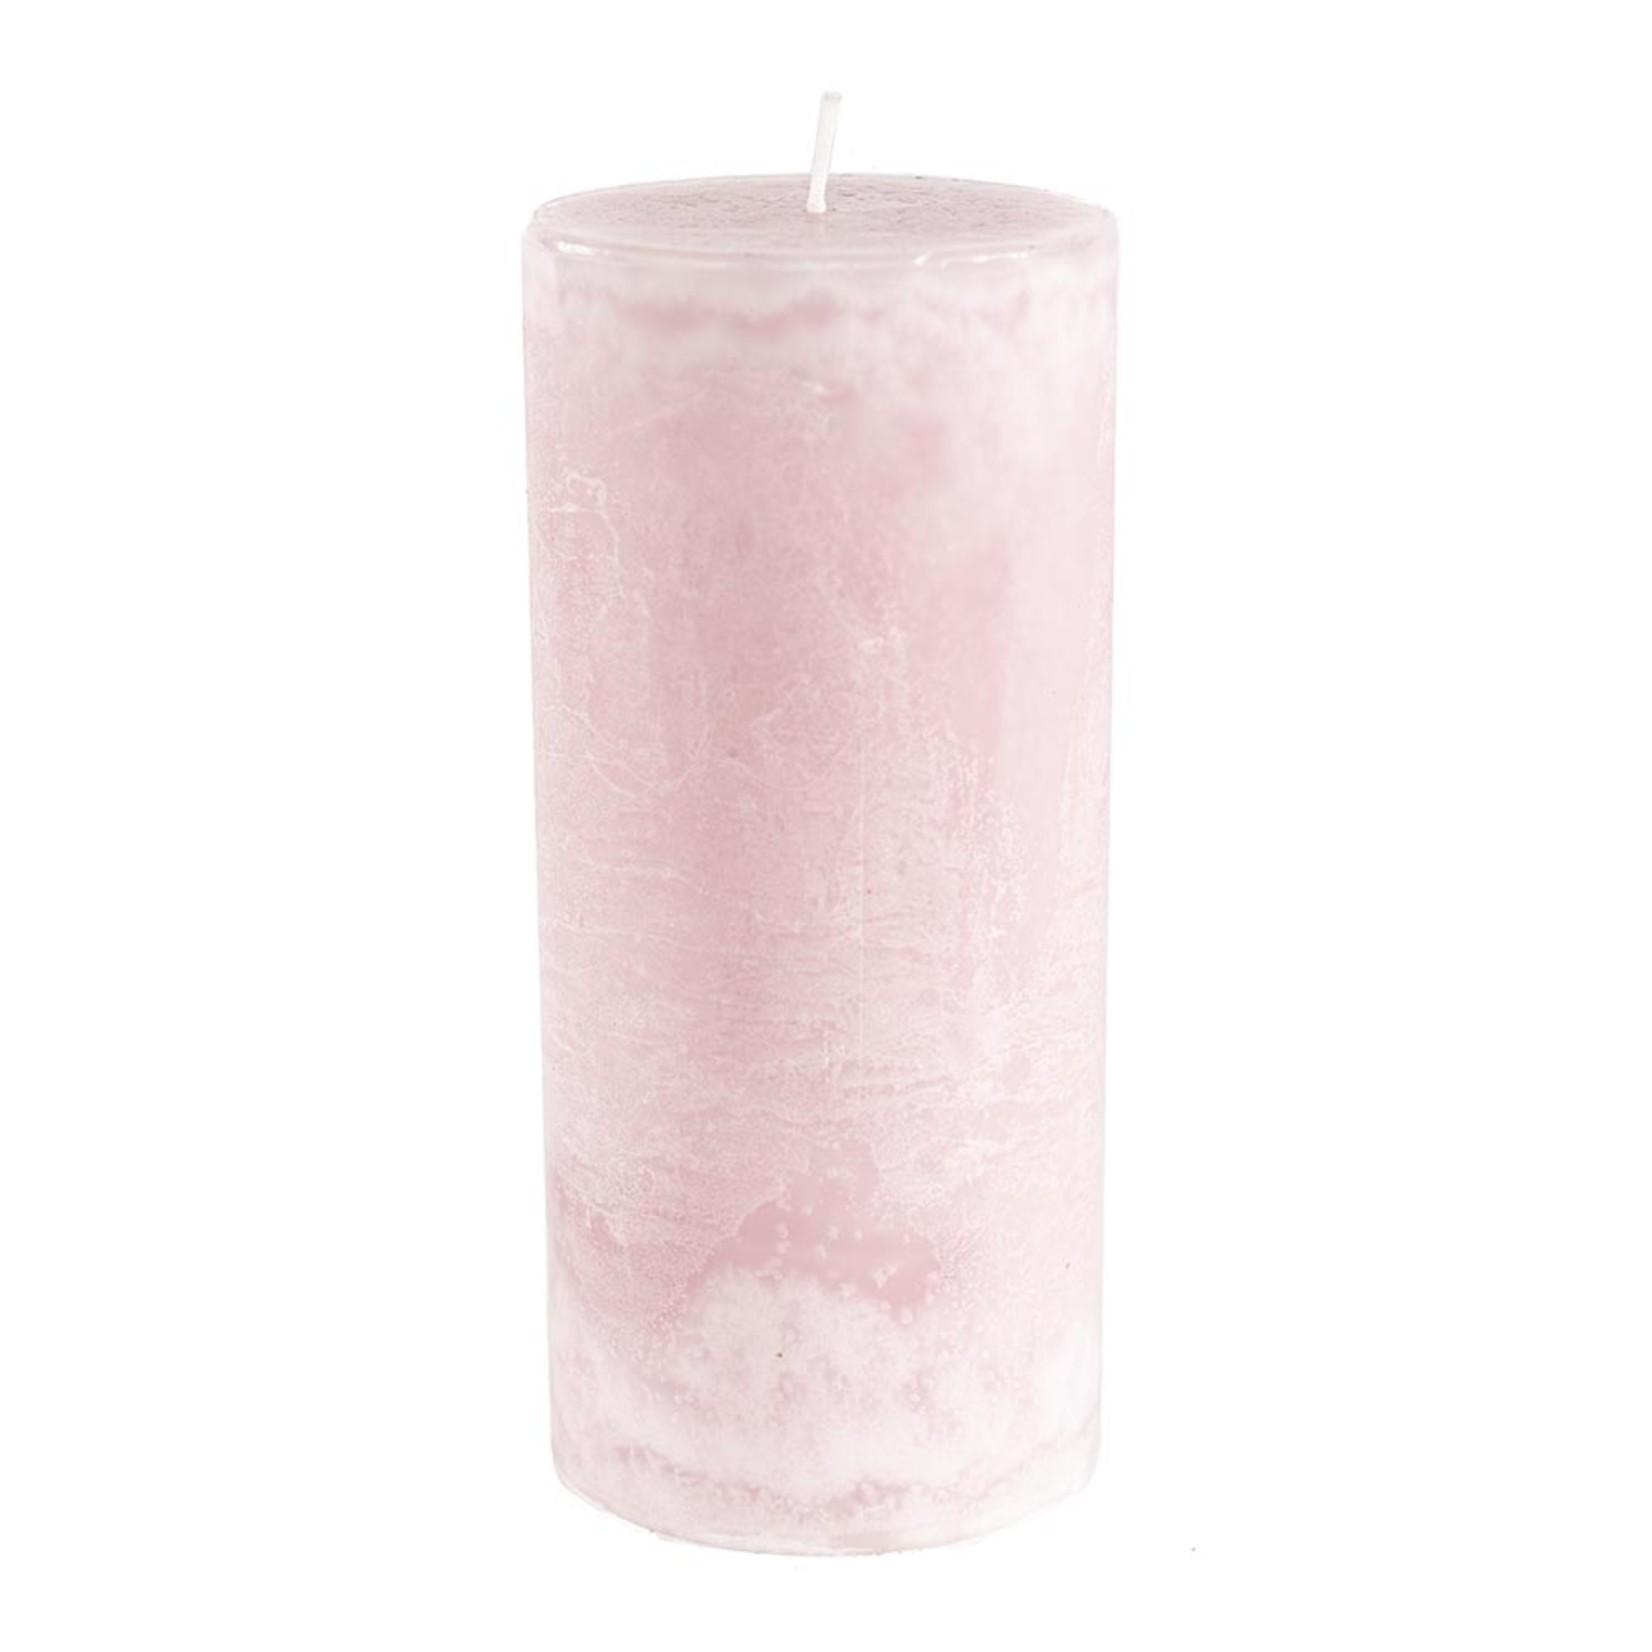 Home Society Pillar Candle 9x20cm LPink